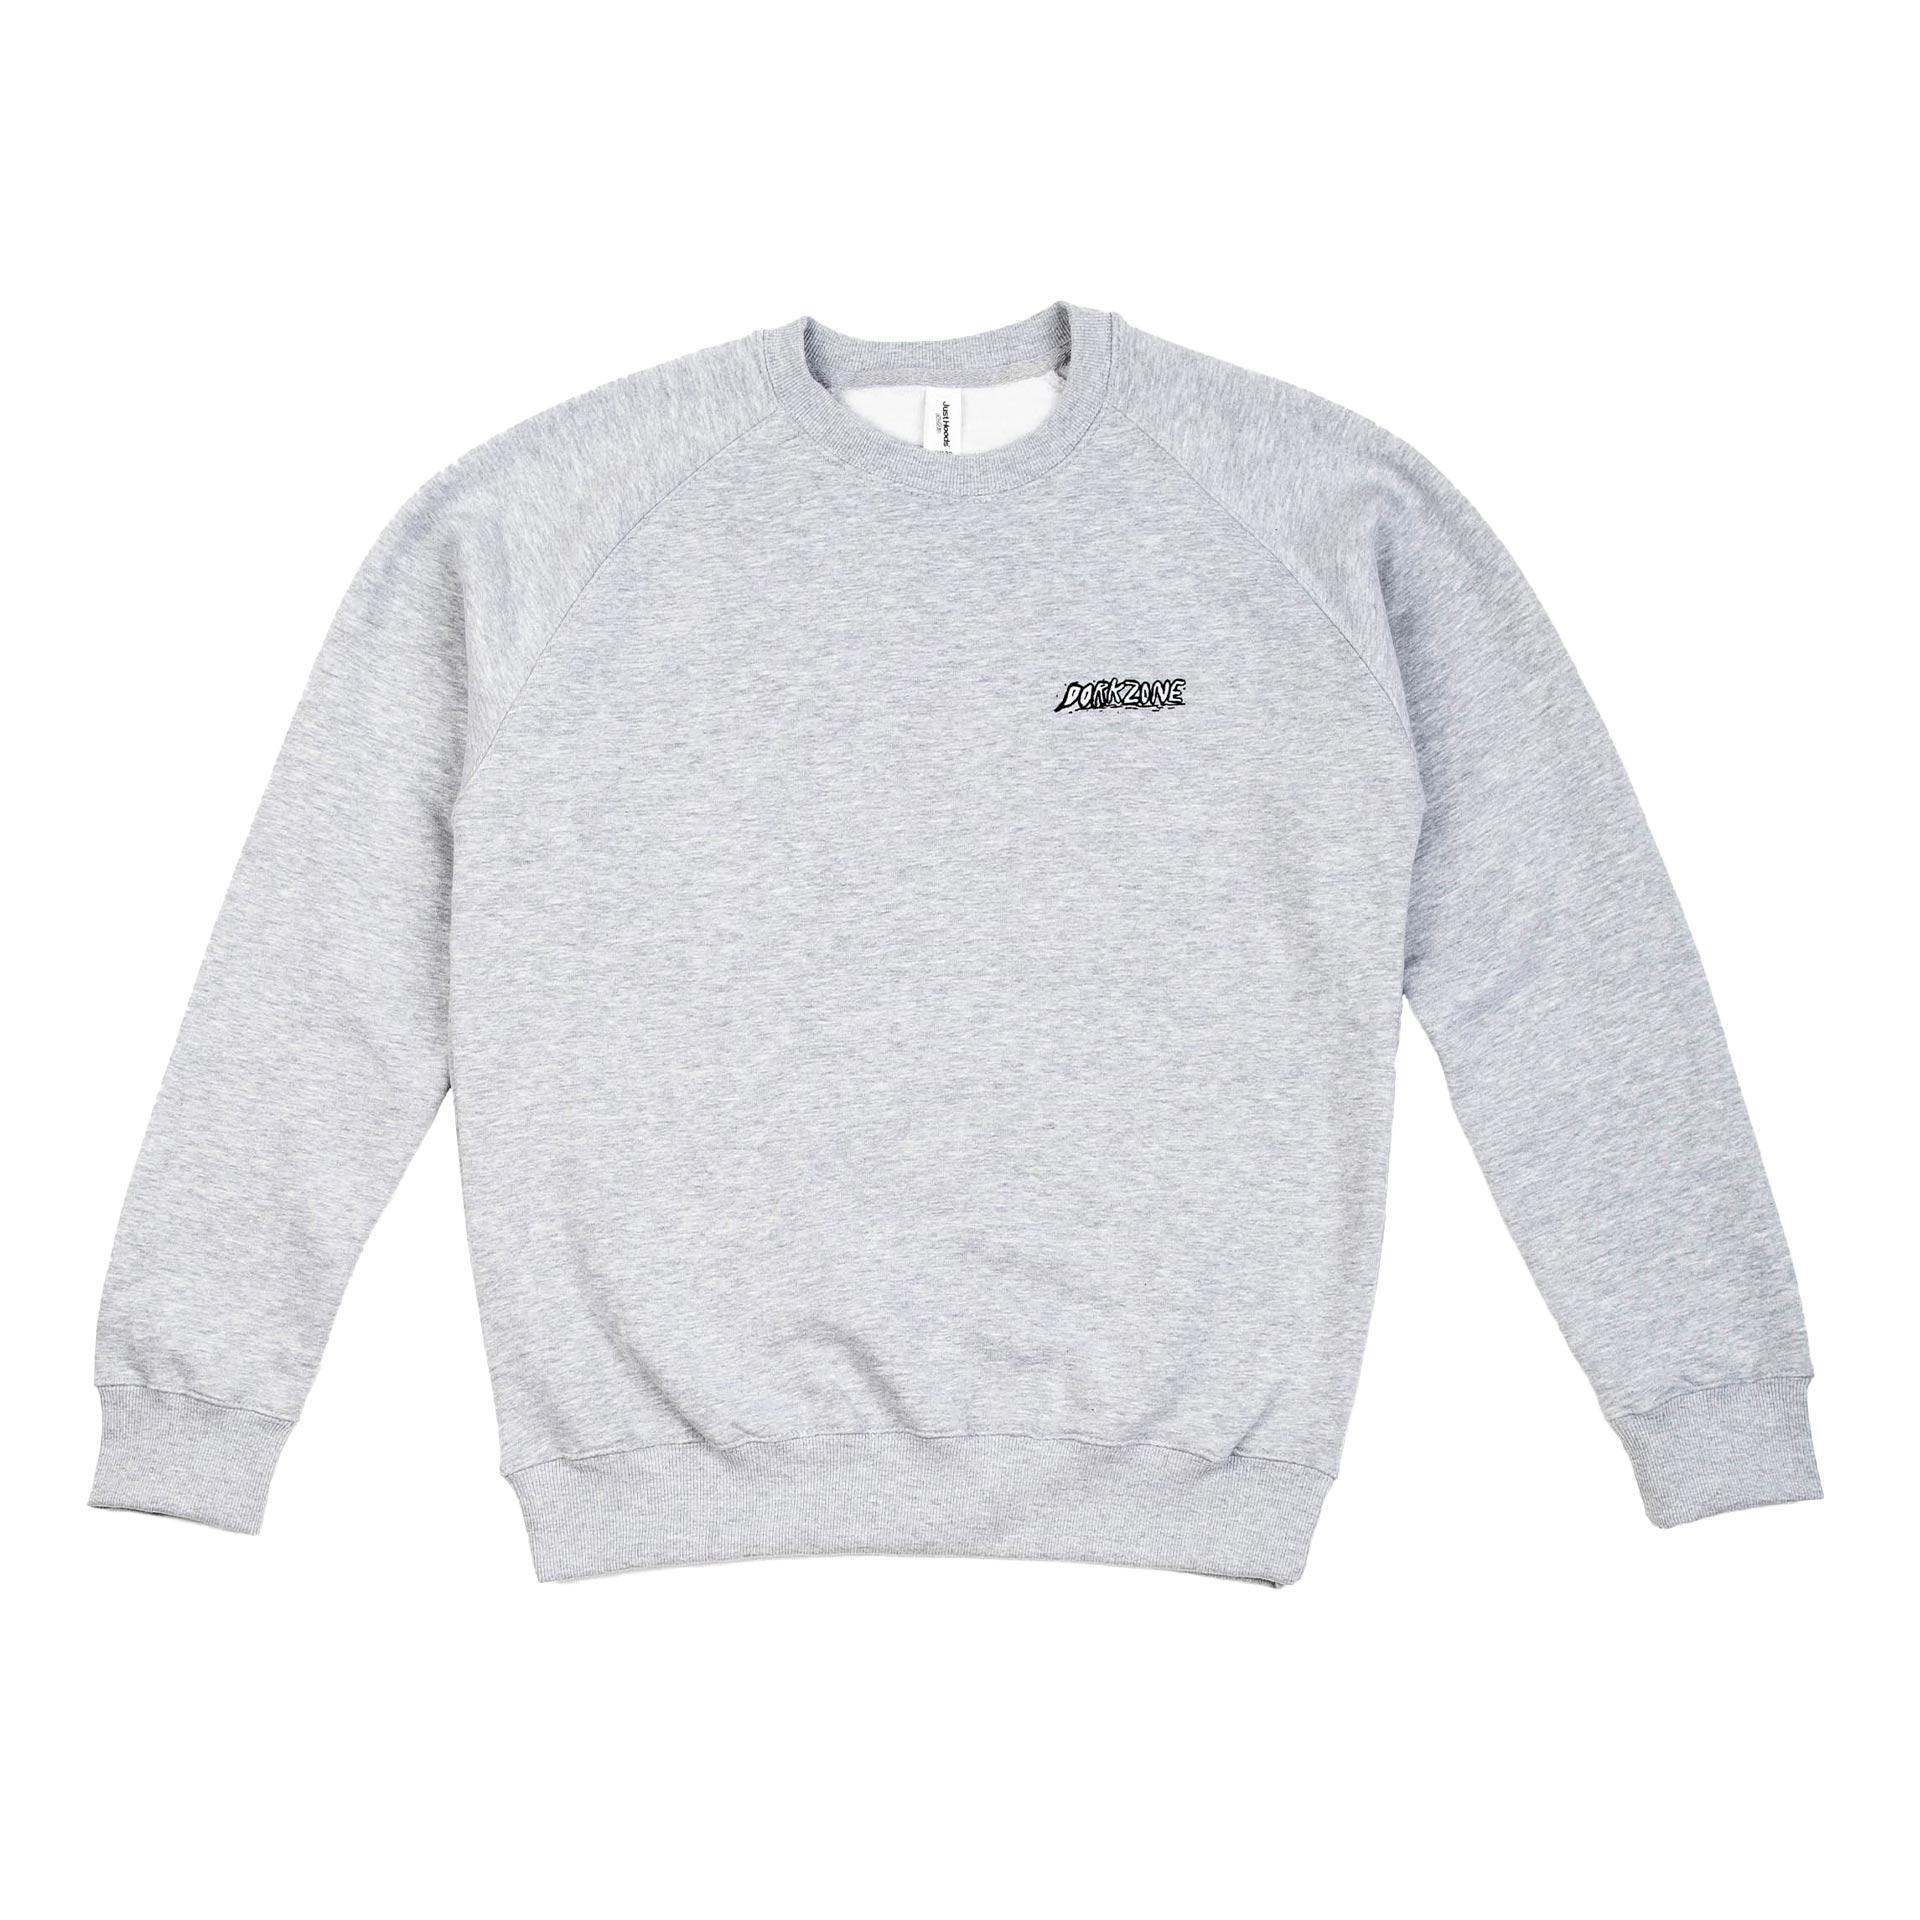 Dorkzone Embroided Ink Text Sweatshirt Heather Grey